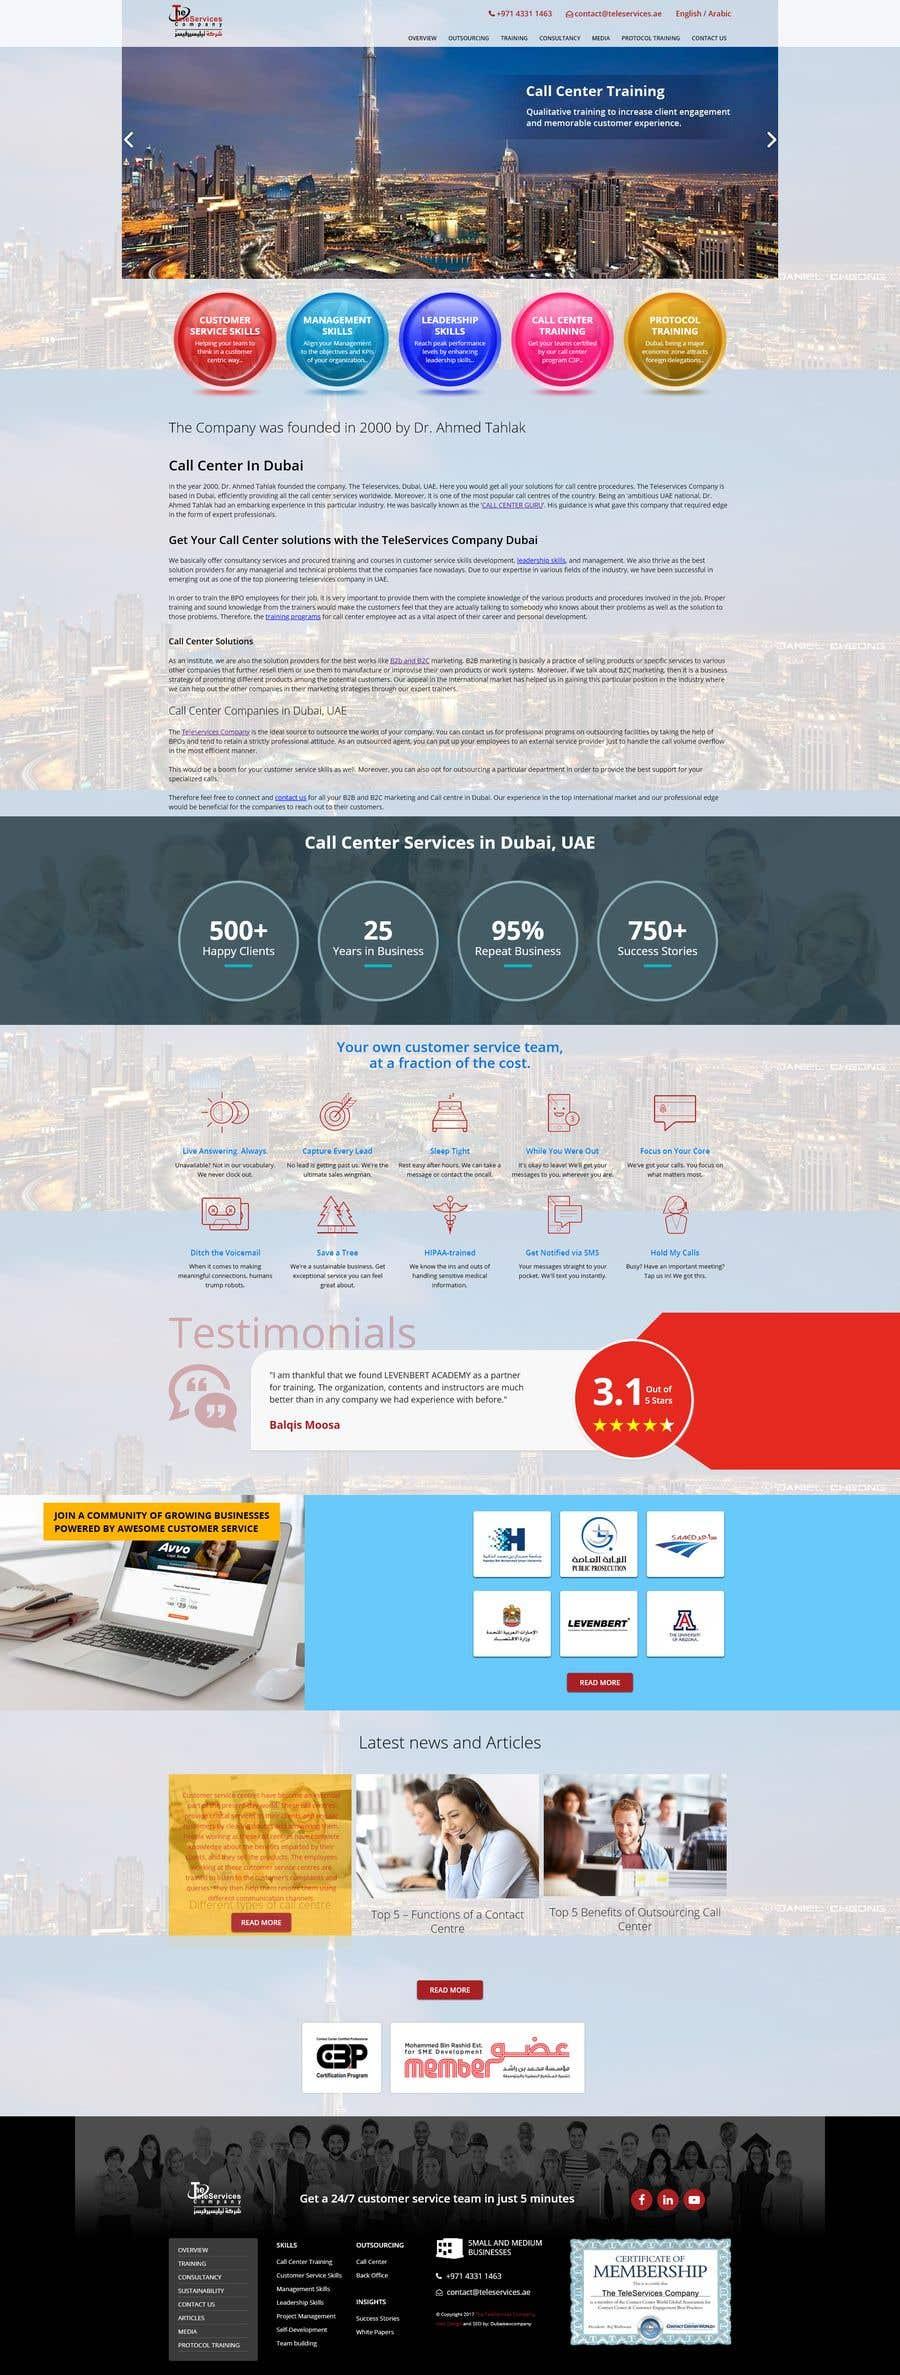 Konkurrenceindlæg #                                        15                                      for                                         Build Excellent Front Page Of our website - 14/05/2021 12:47 EDT